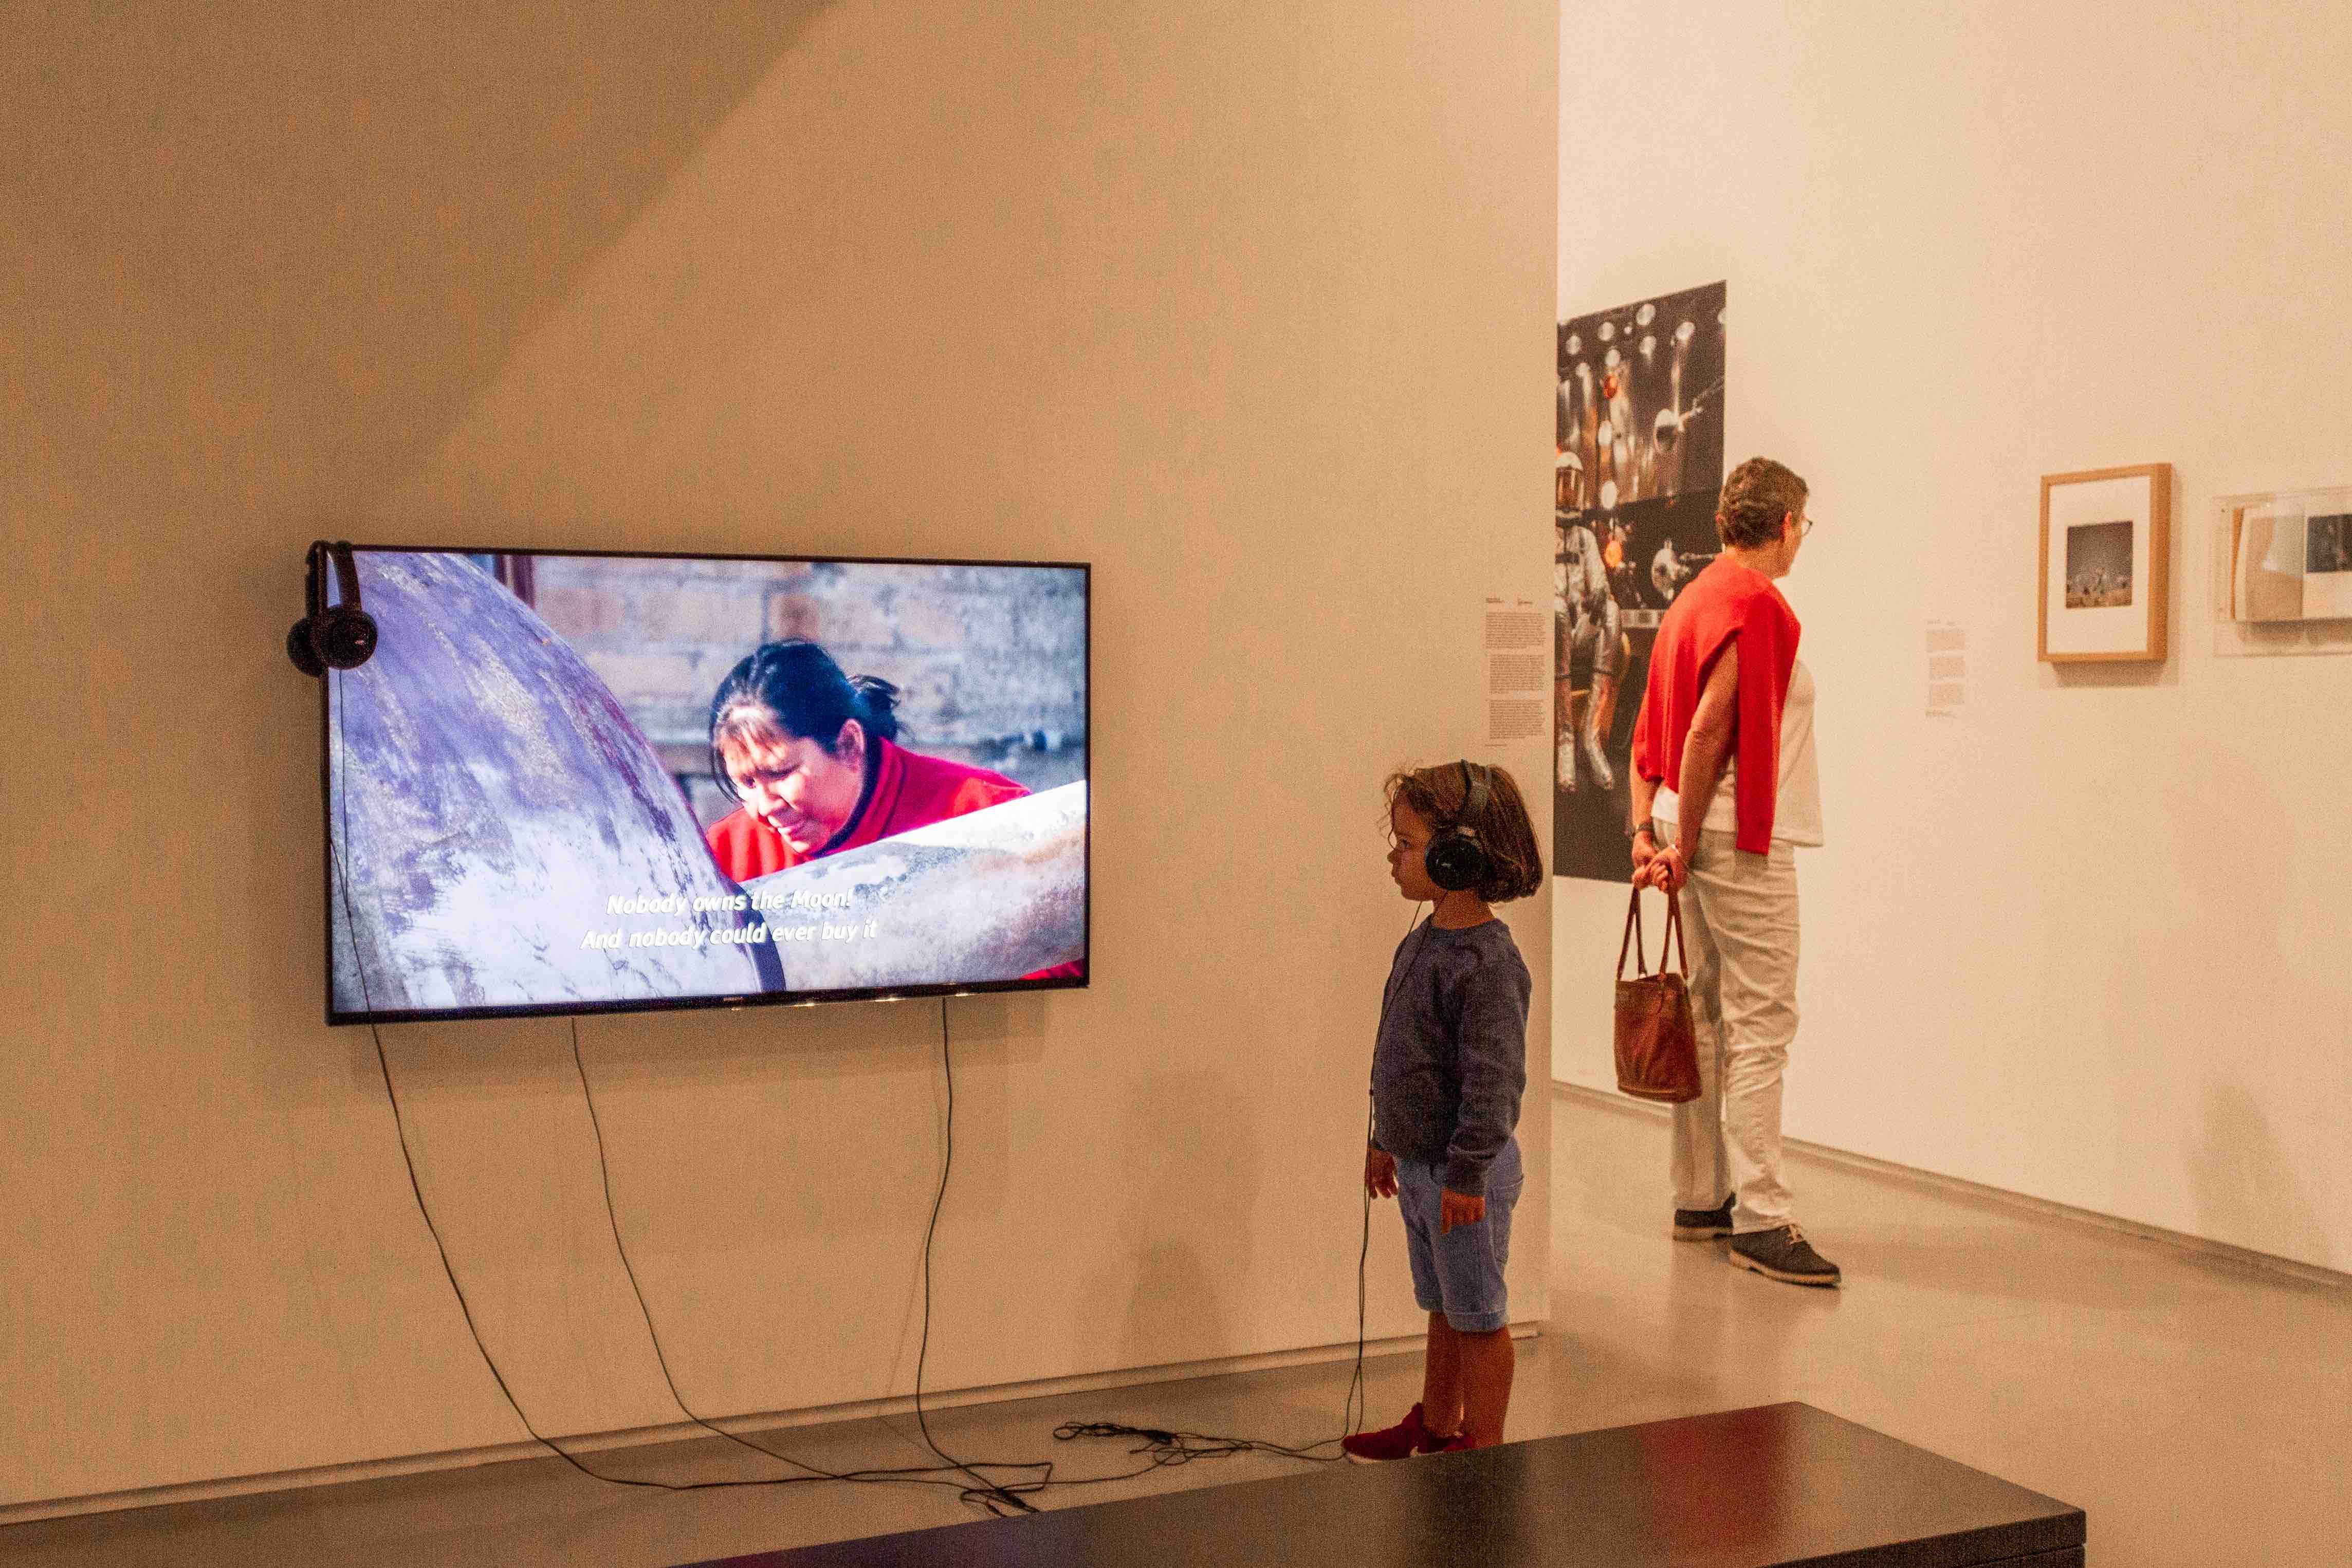 Dall'Italia all'Olanda in macchina: visita ai musei con i bambini